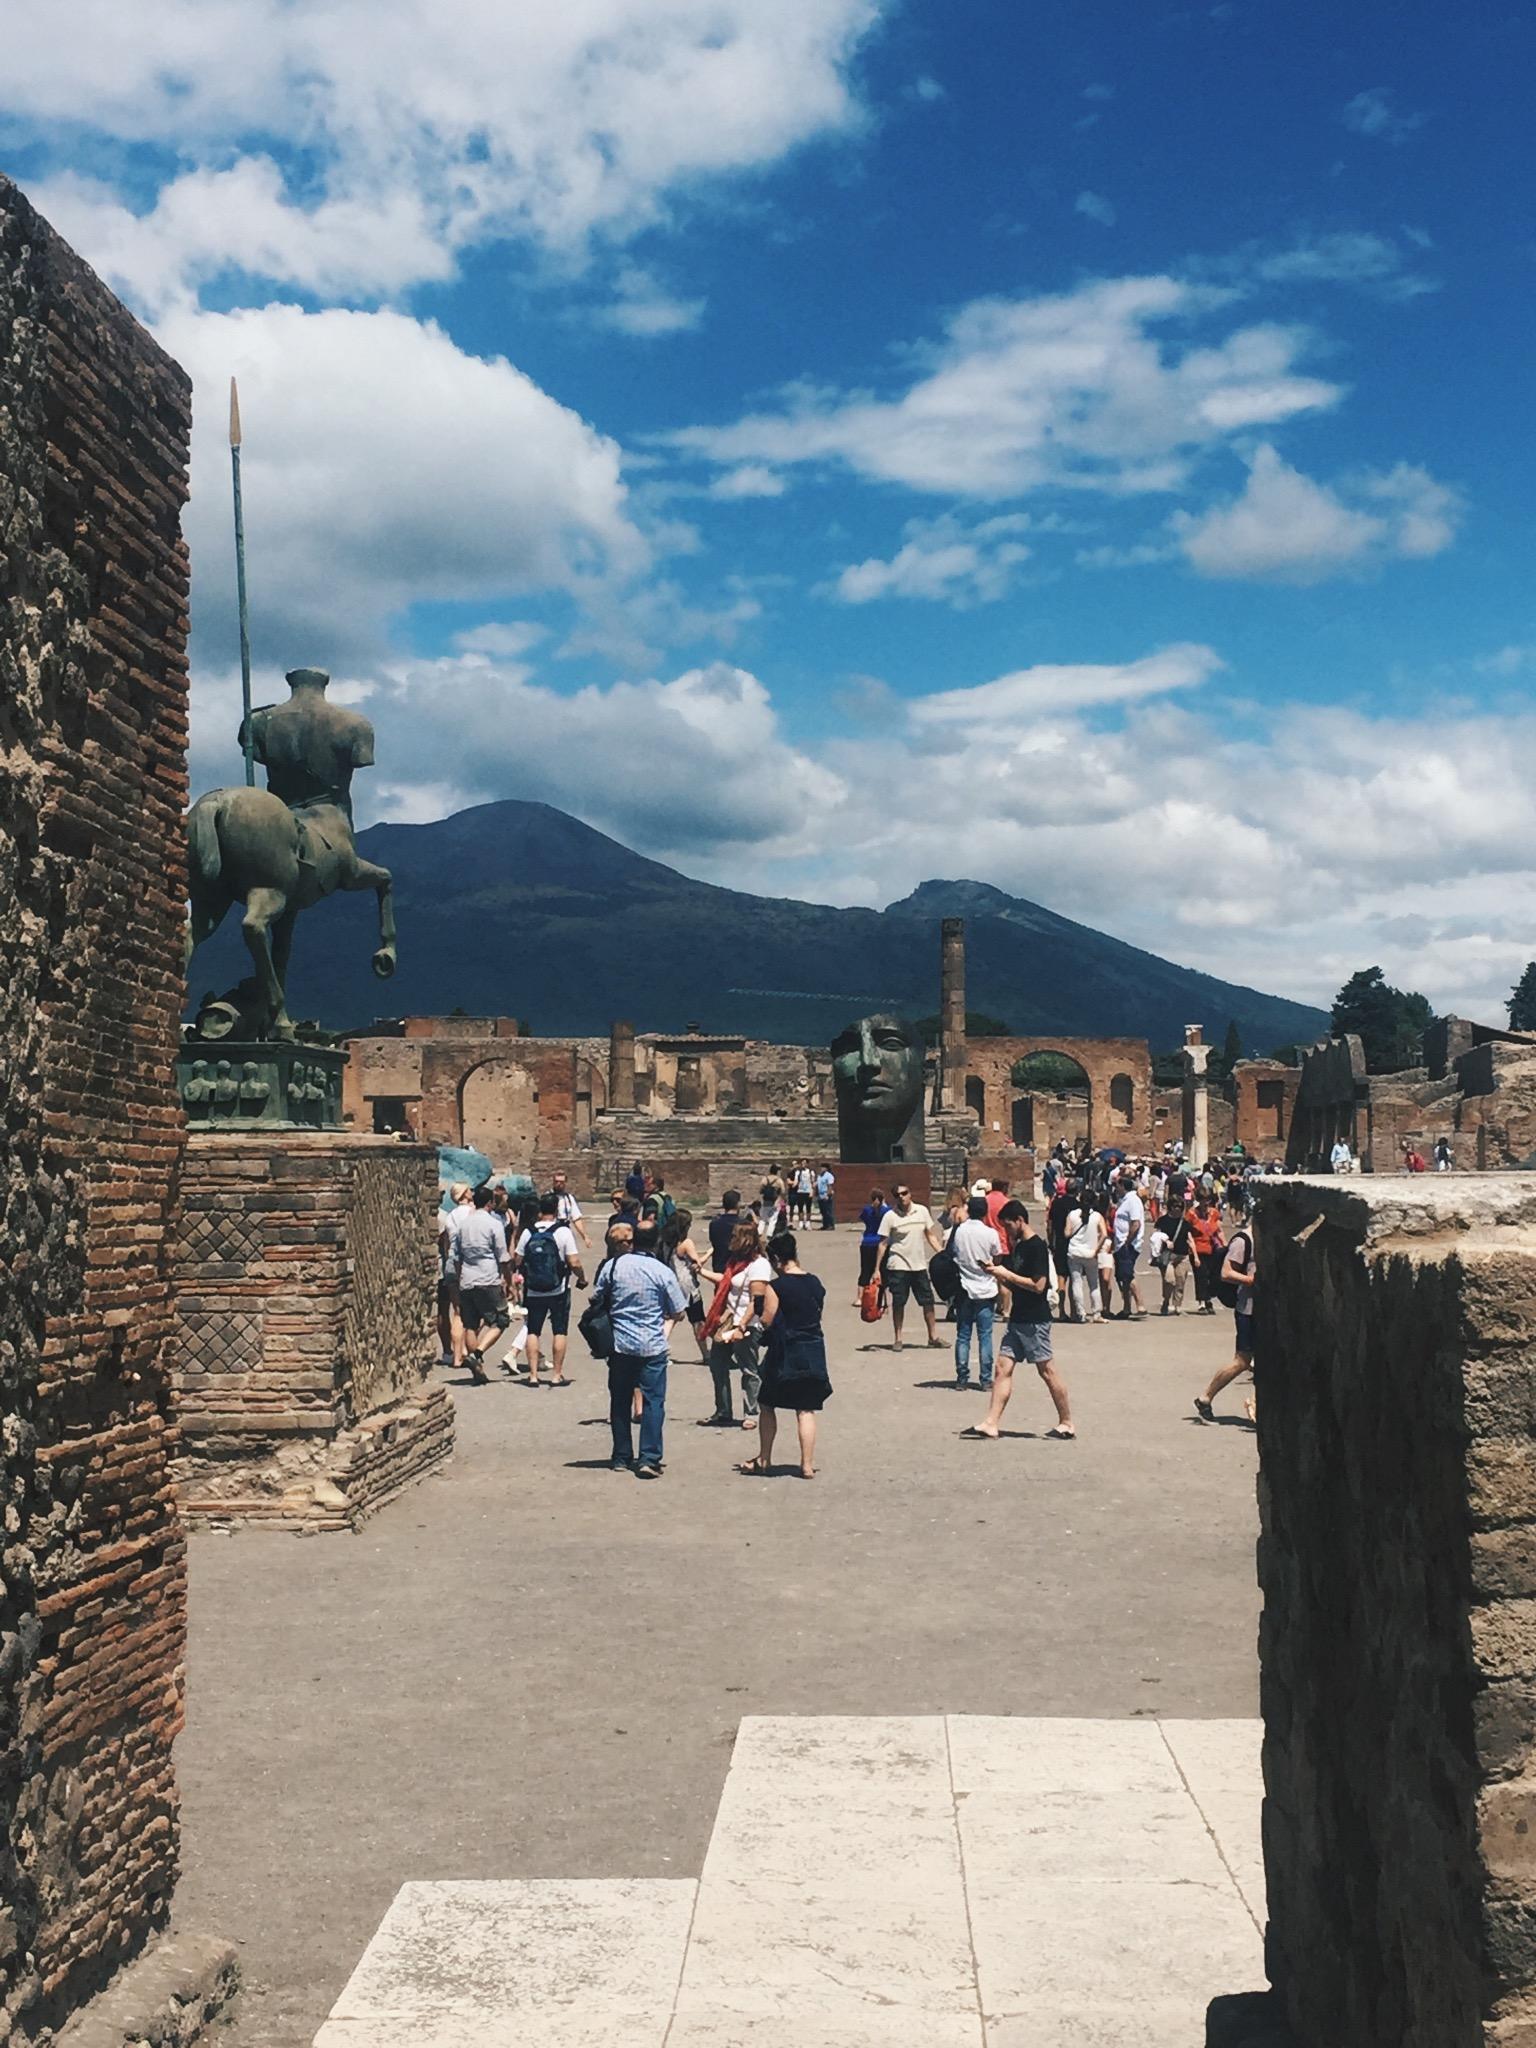 My Last Days of Pompeii Rory Mara The Attic on Eighth Forum